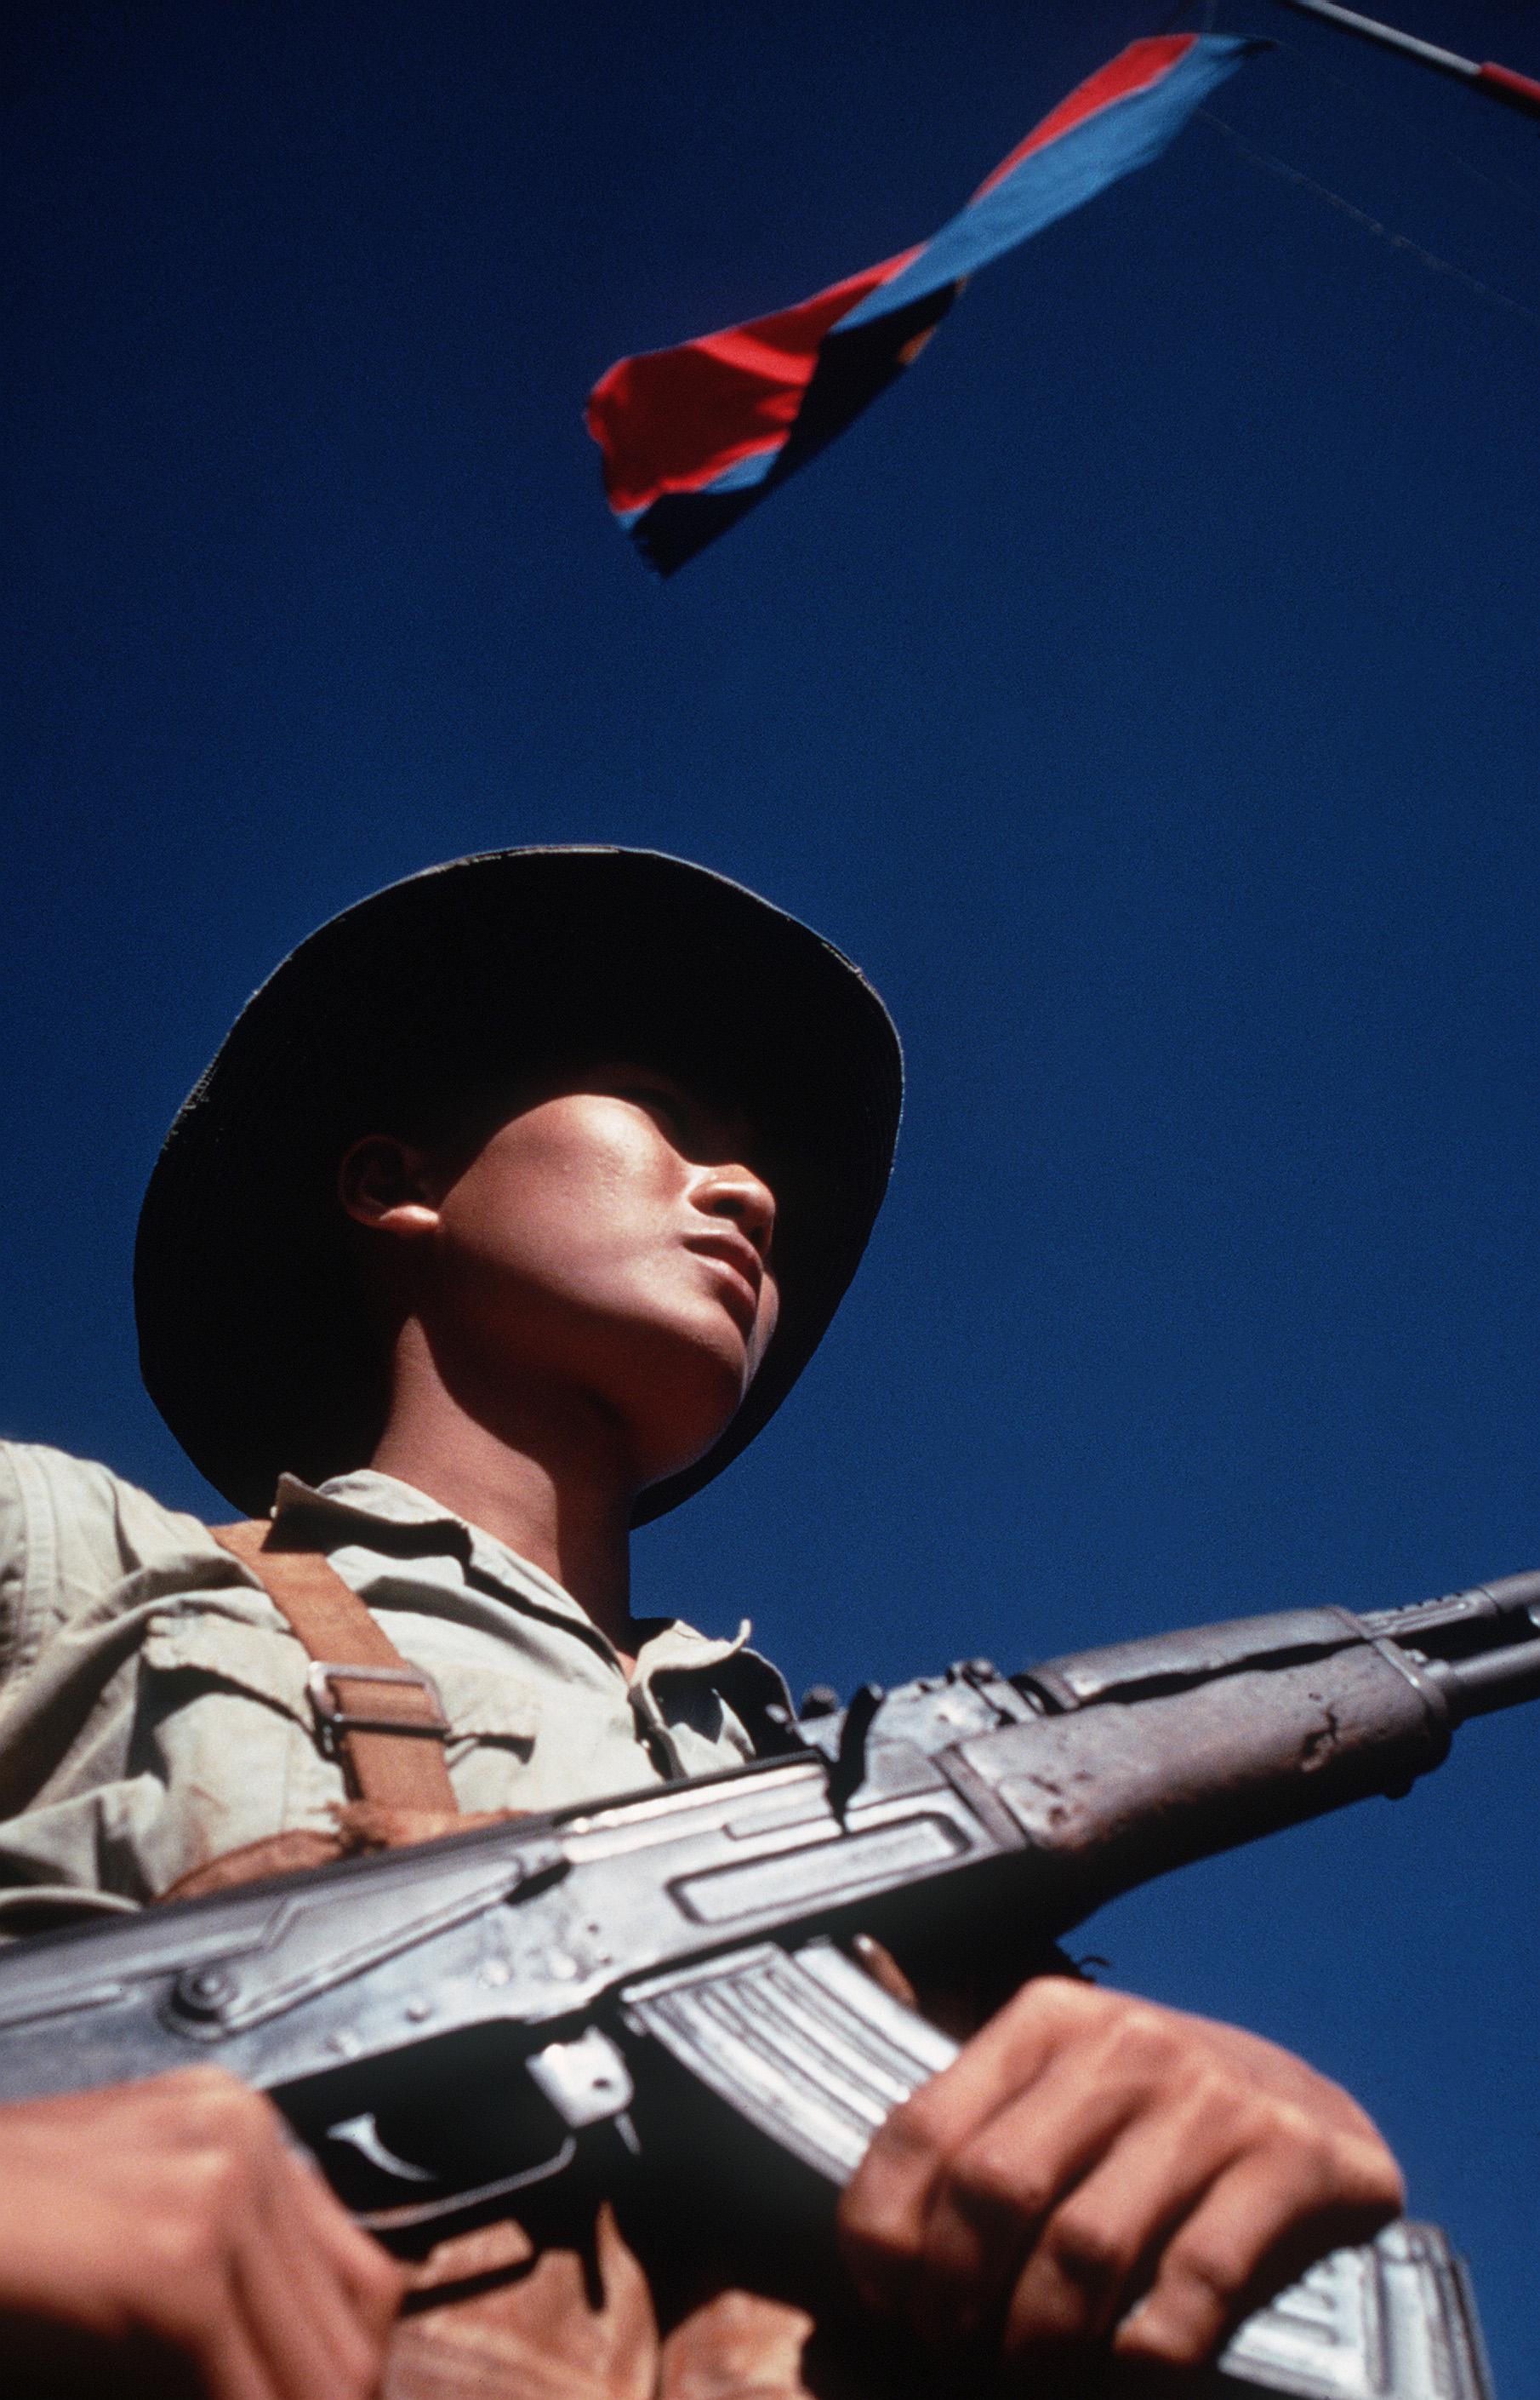 Description Viet Cong soldier DD-ST-99-04298.jpg